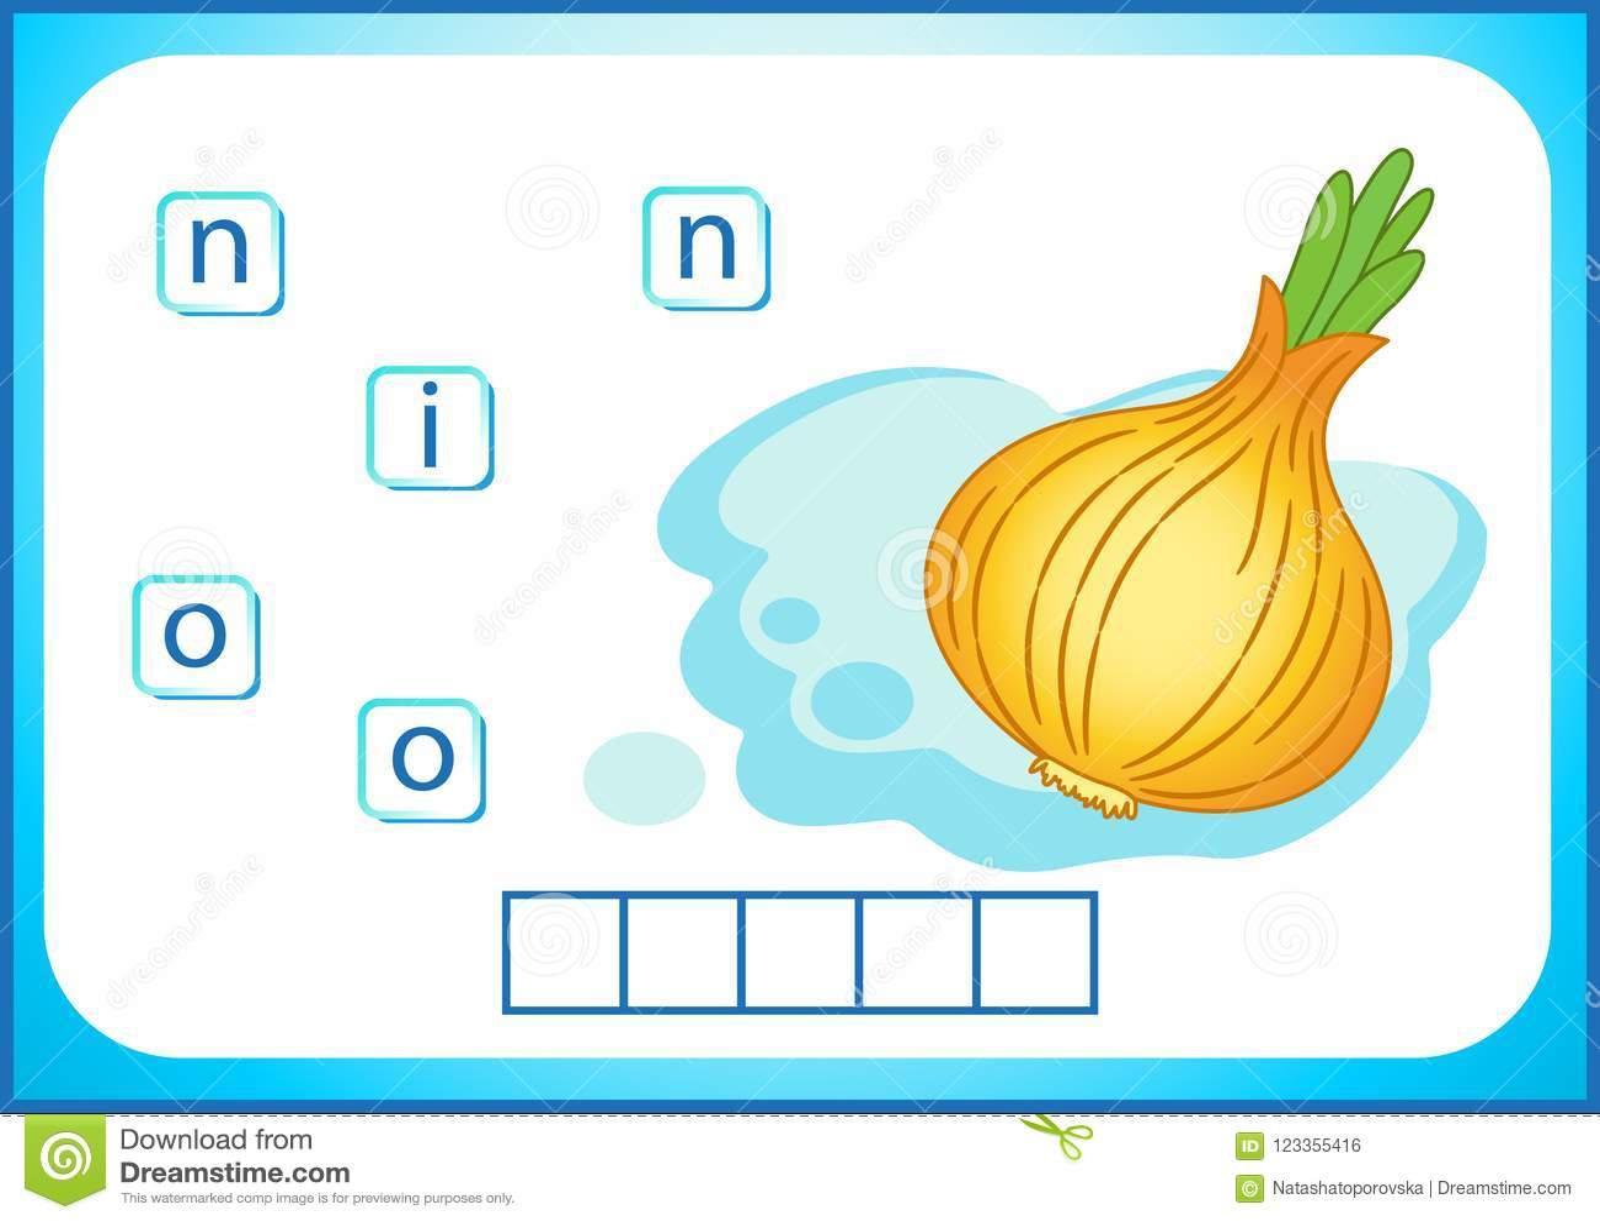 School Education English Flashcard For Learning English